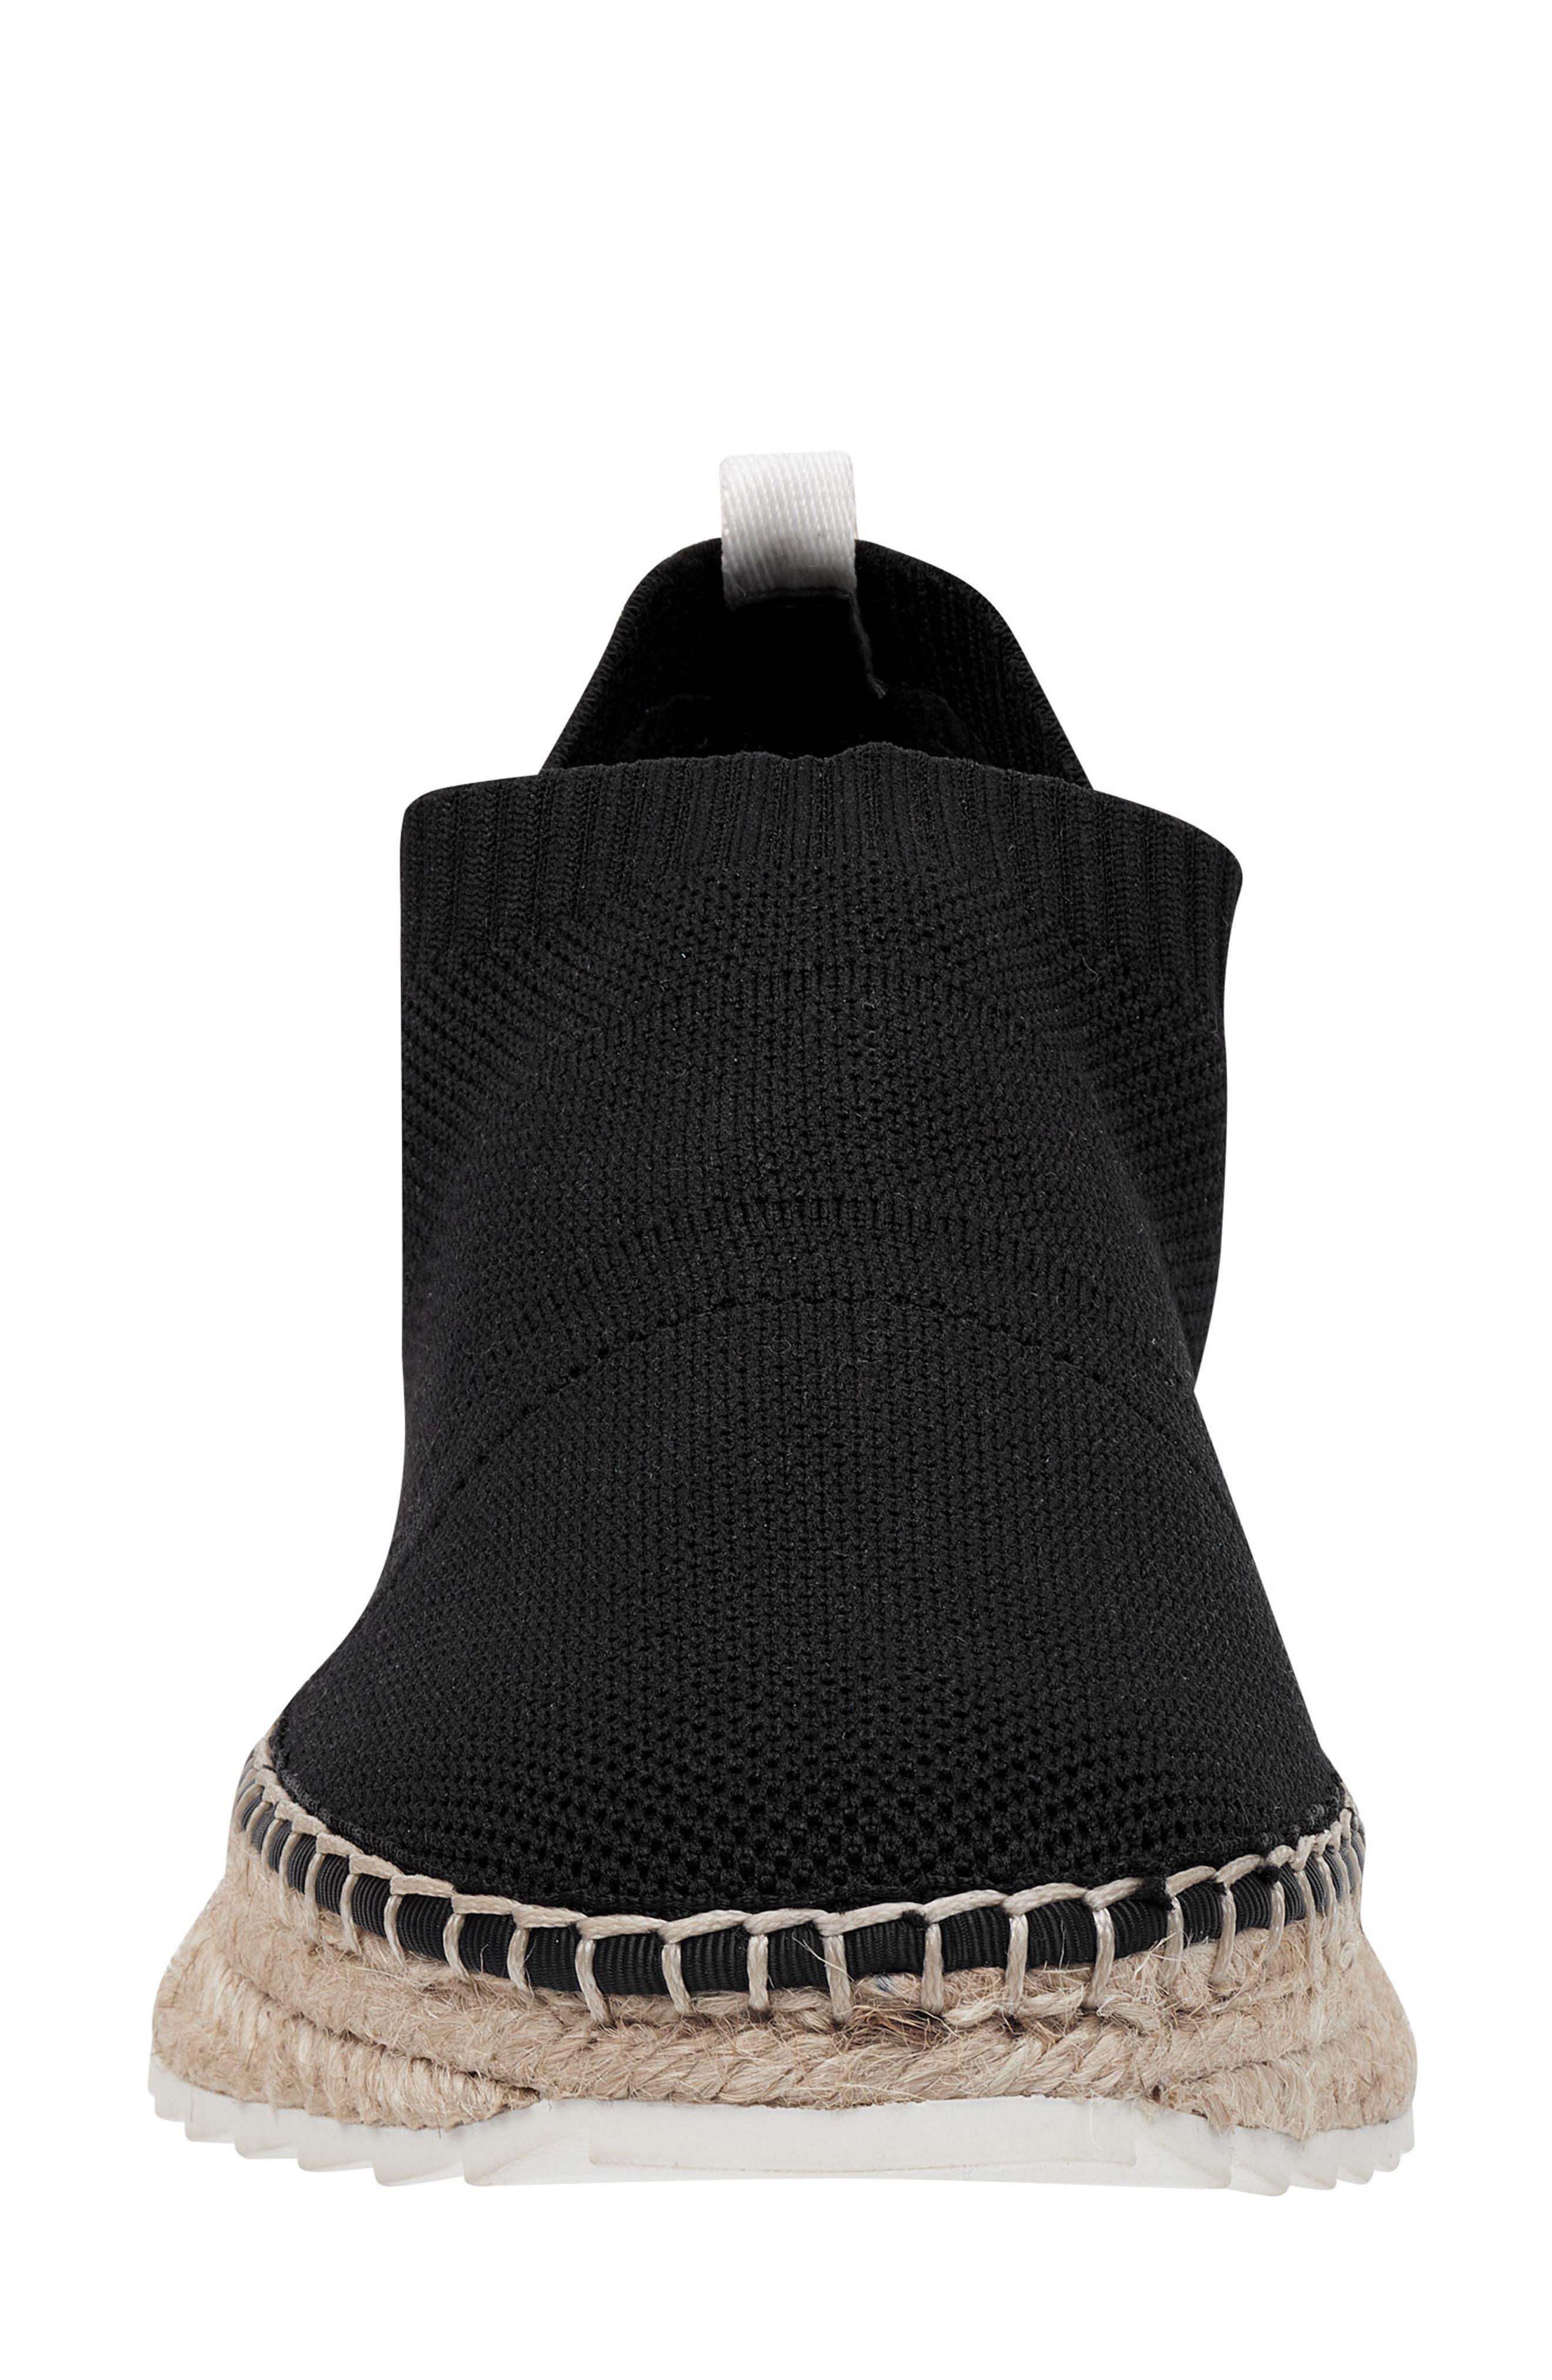 MARC FISHER LTD,                             Jilly Espadrille Sneaker,                             Alternate thumbnail 4, color,                             BLACK FABRIC